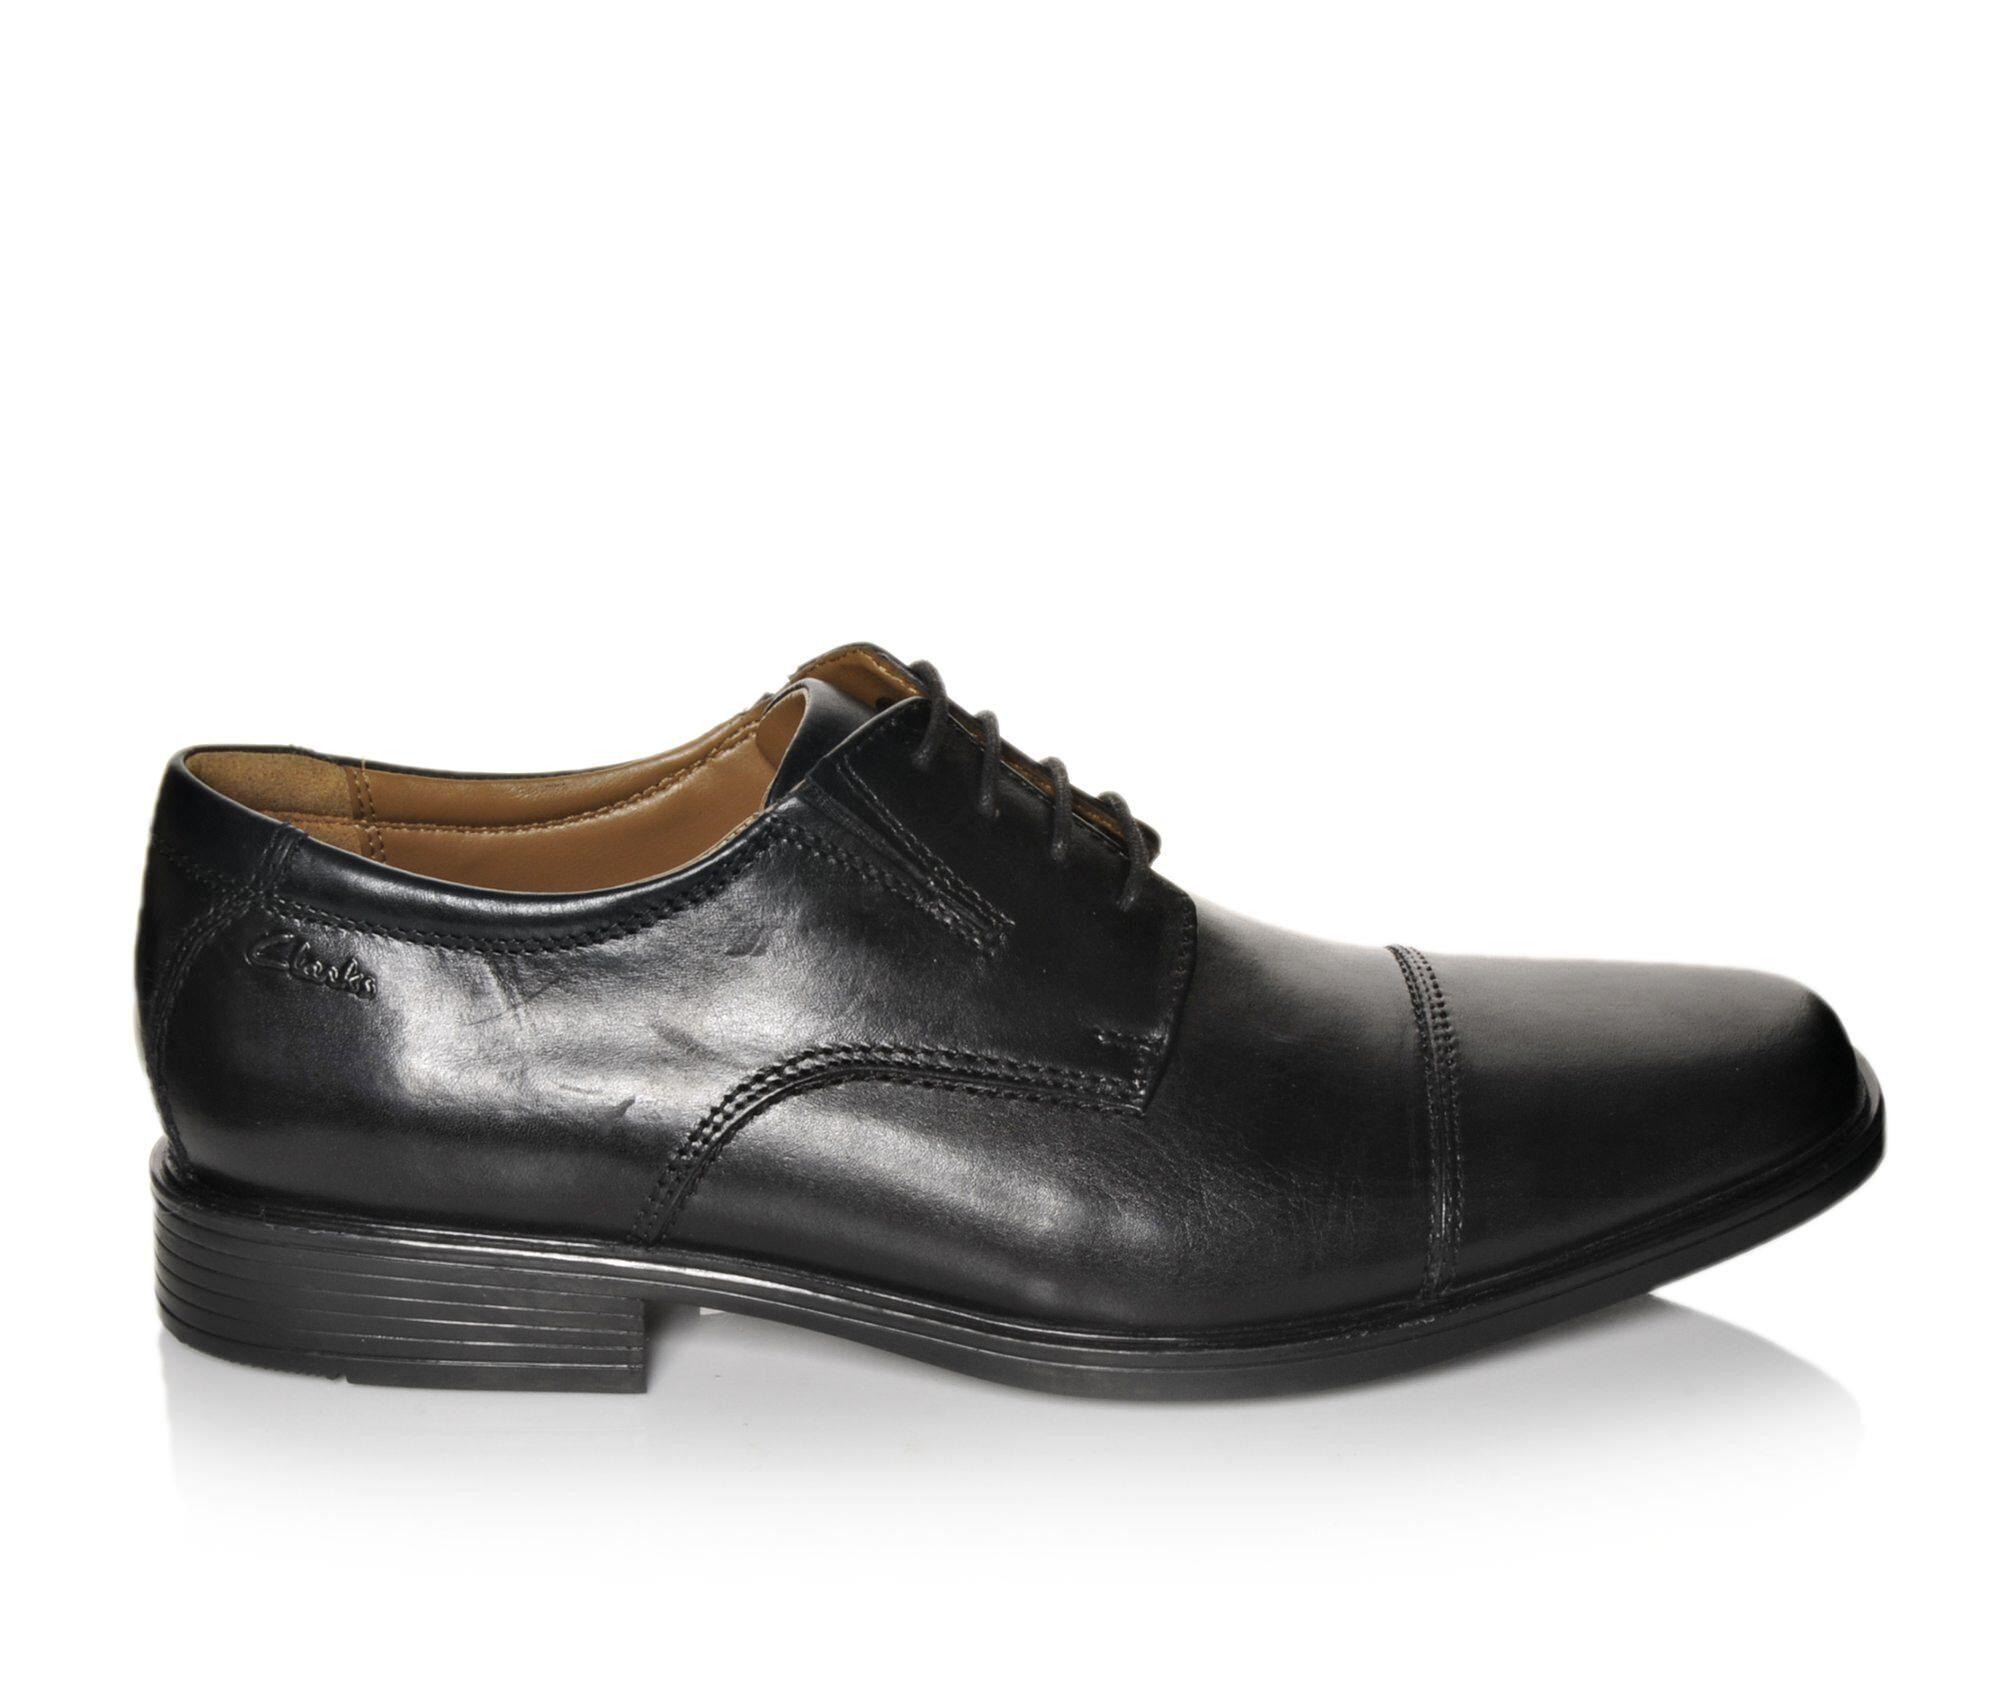 great deals cheap price Men's Clarks Tilden Cap Dress Shoes sneakernews cheap online visit new for sale discount how much best seller cheap price hmwLn